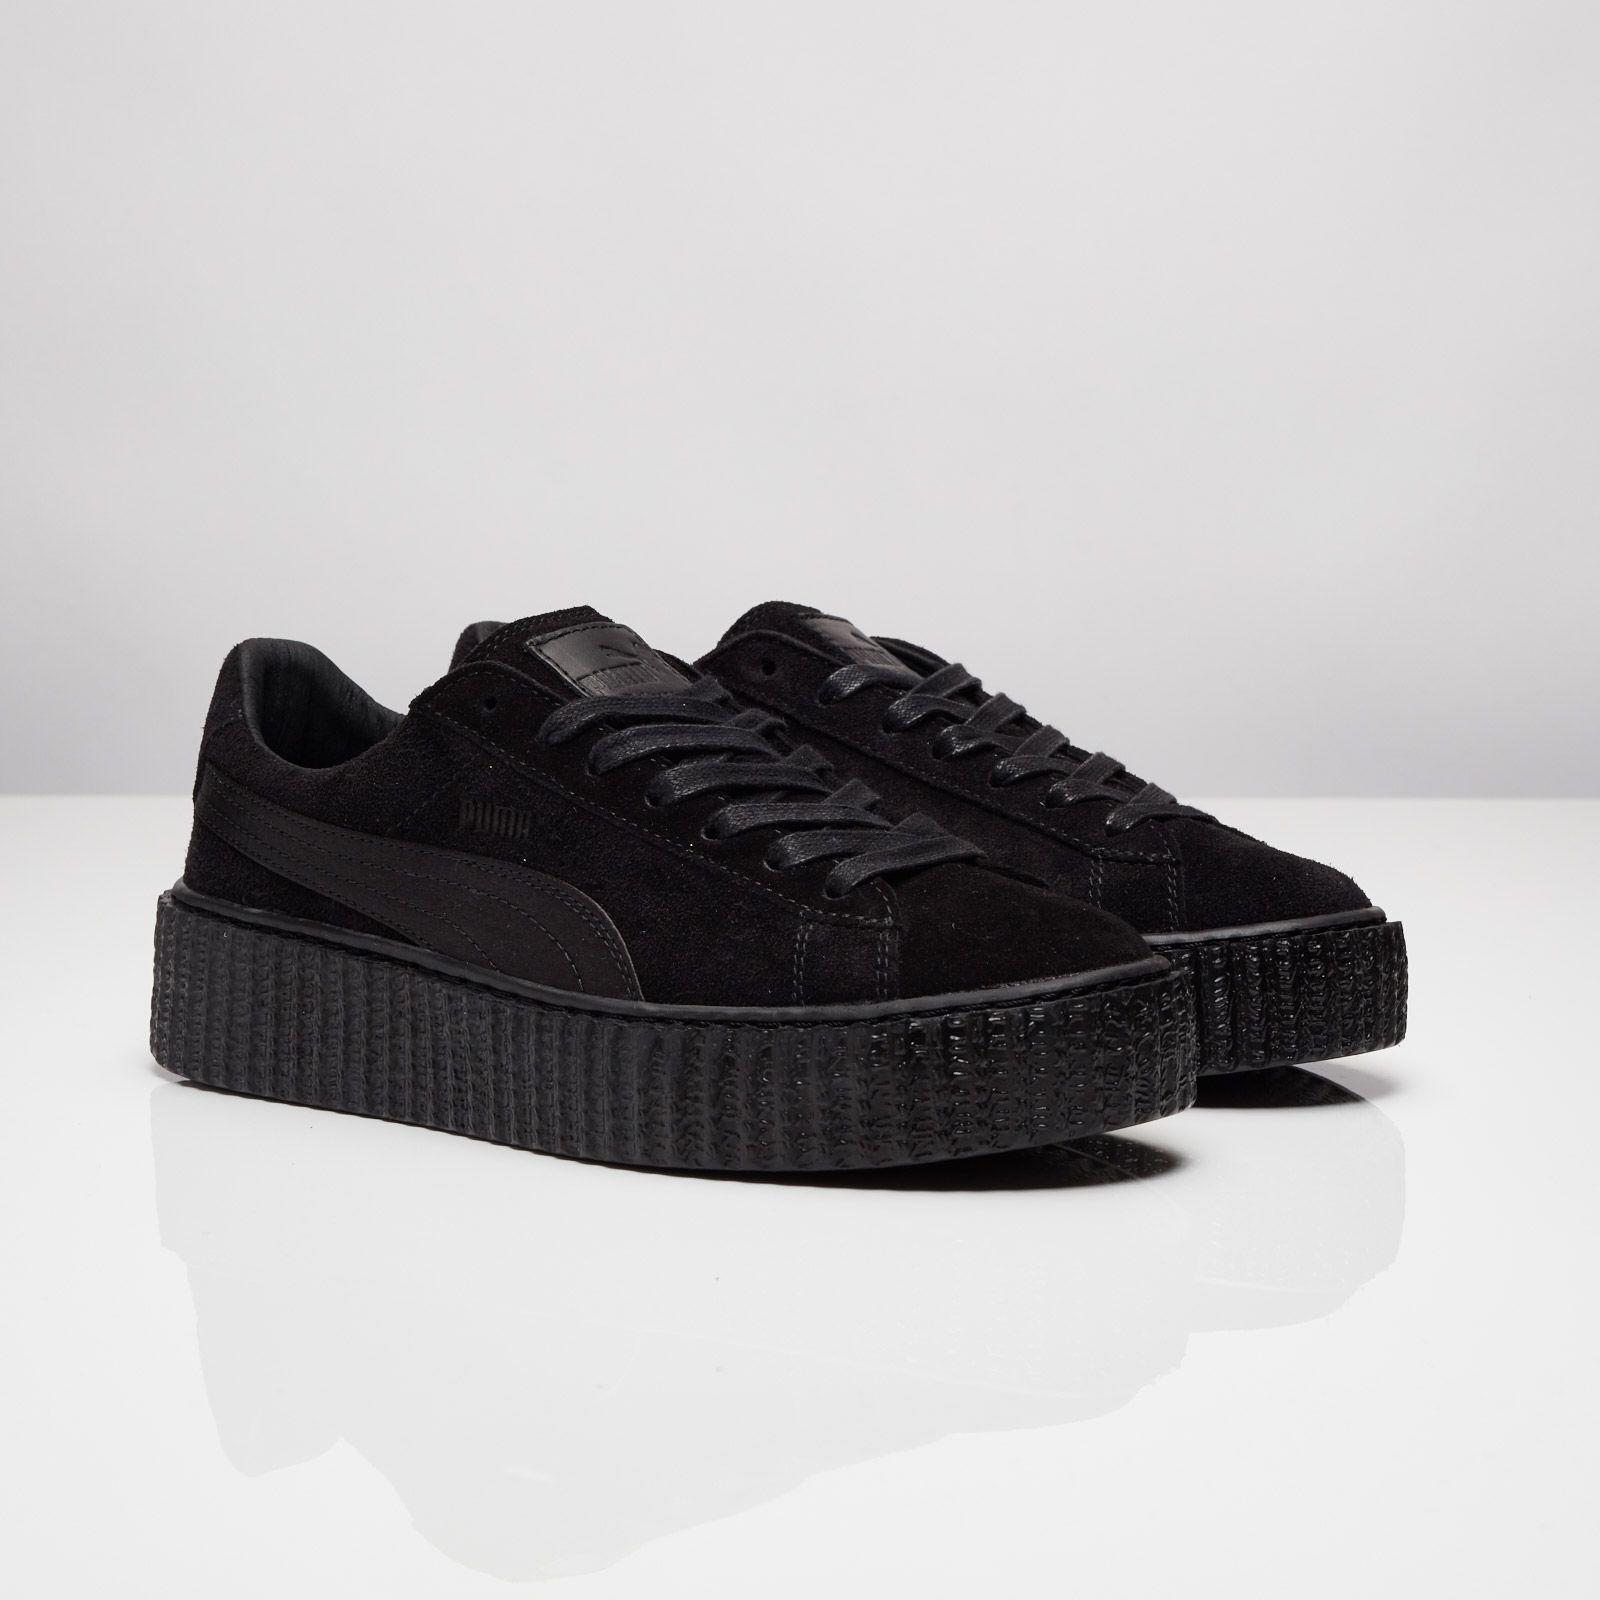 PUMA Suede Creepers Satin Rihanna | SHOES | Sneakers, Idées